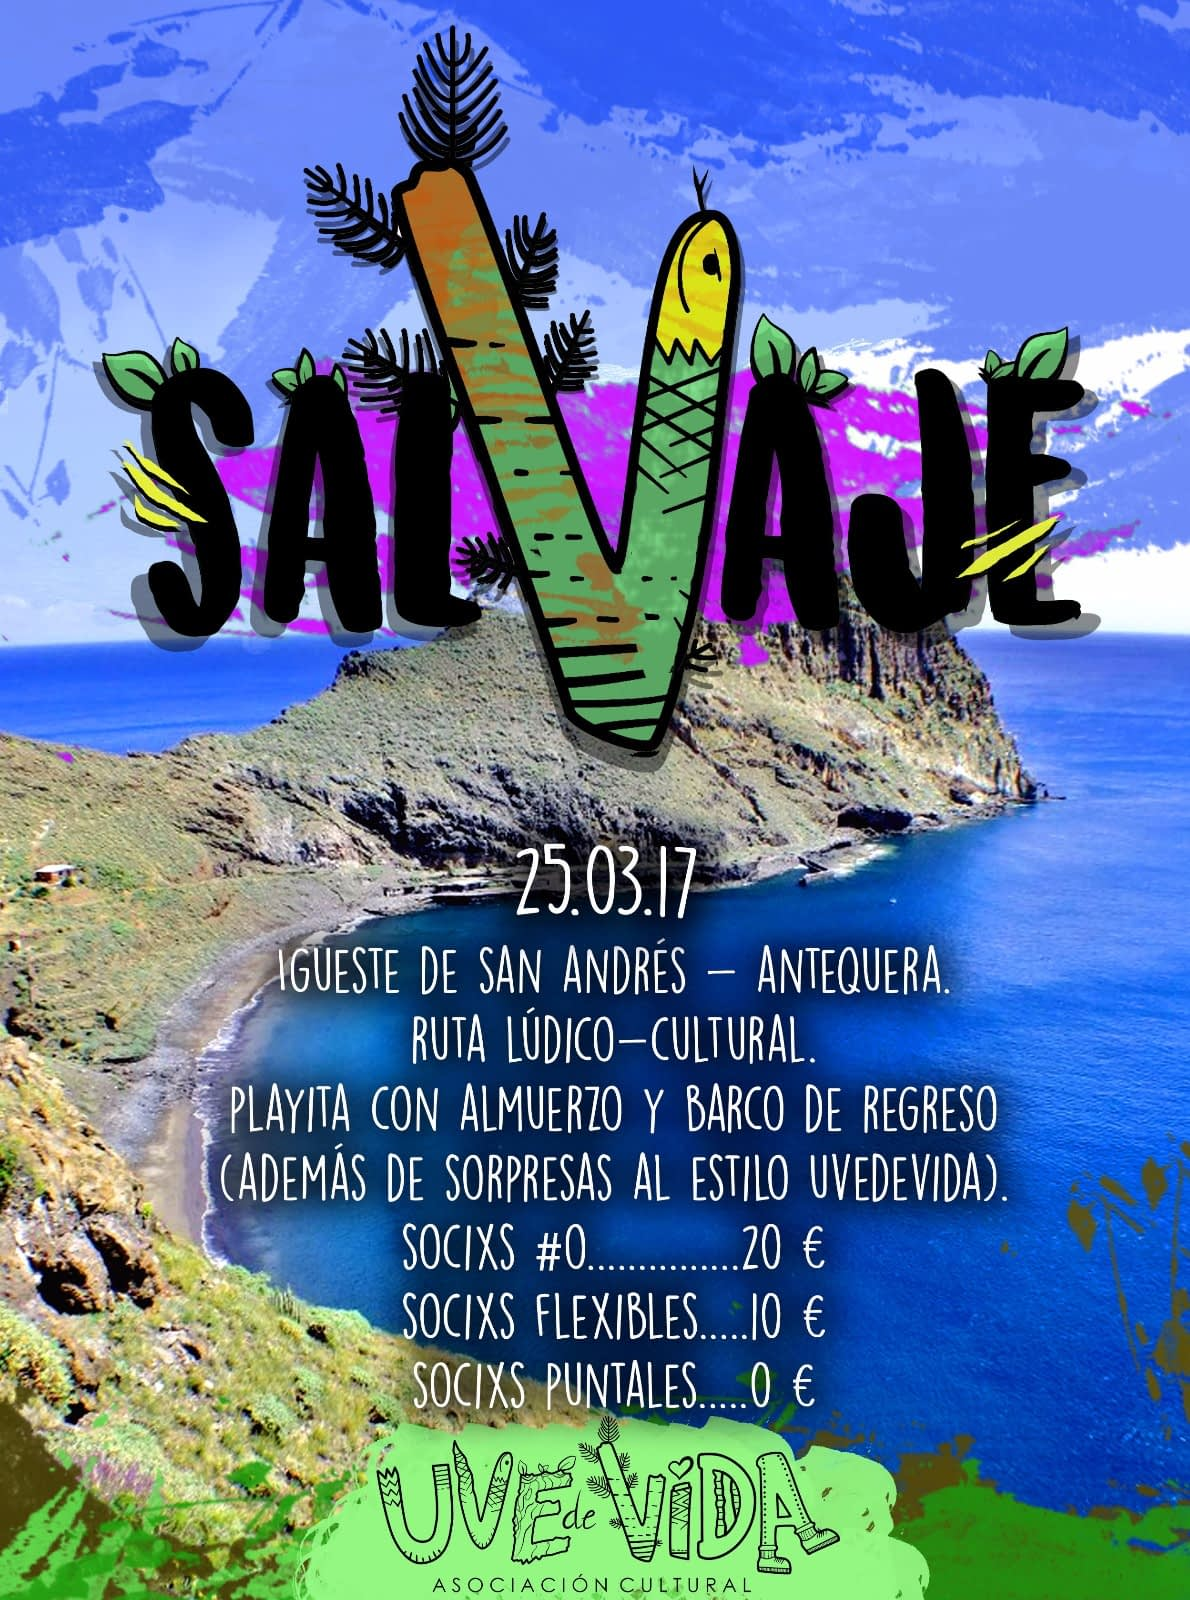 SalVaje Igueste de San Andrés-Antequera